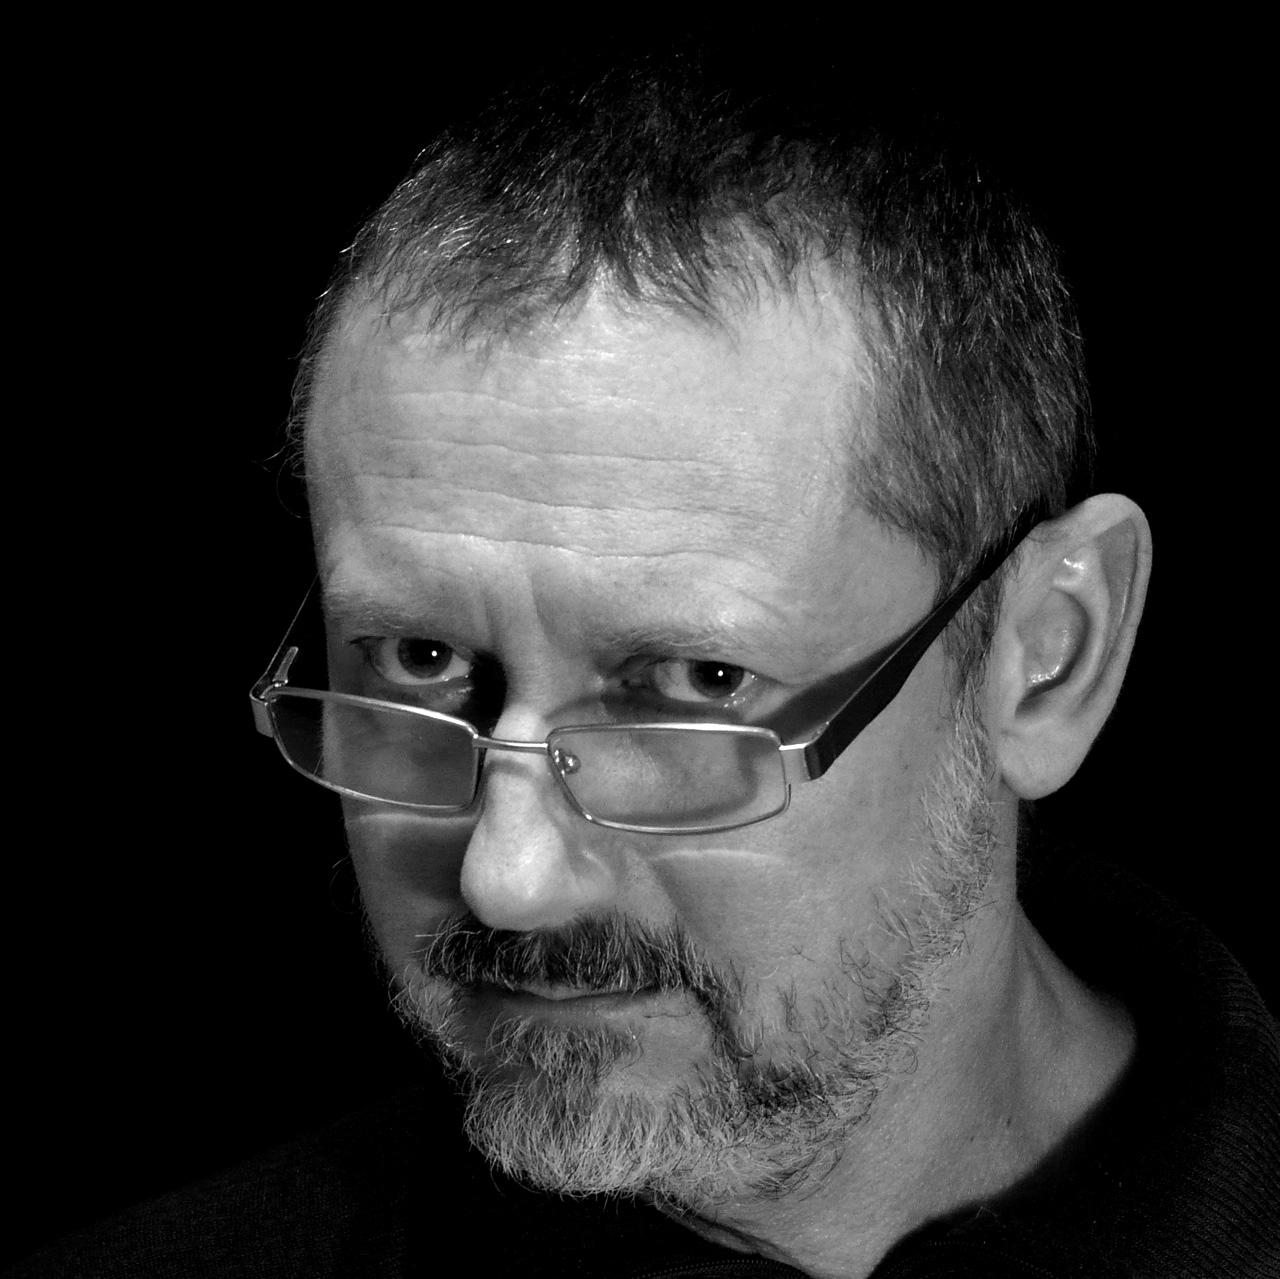 Jan Korwin-Kochanowski